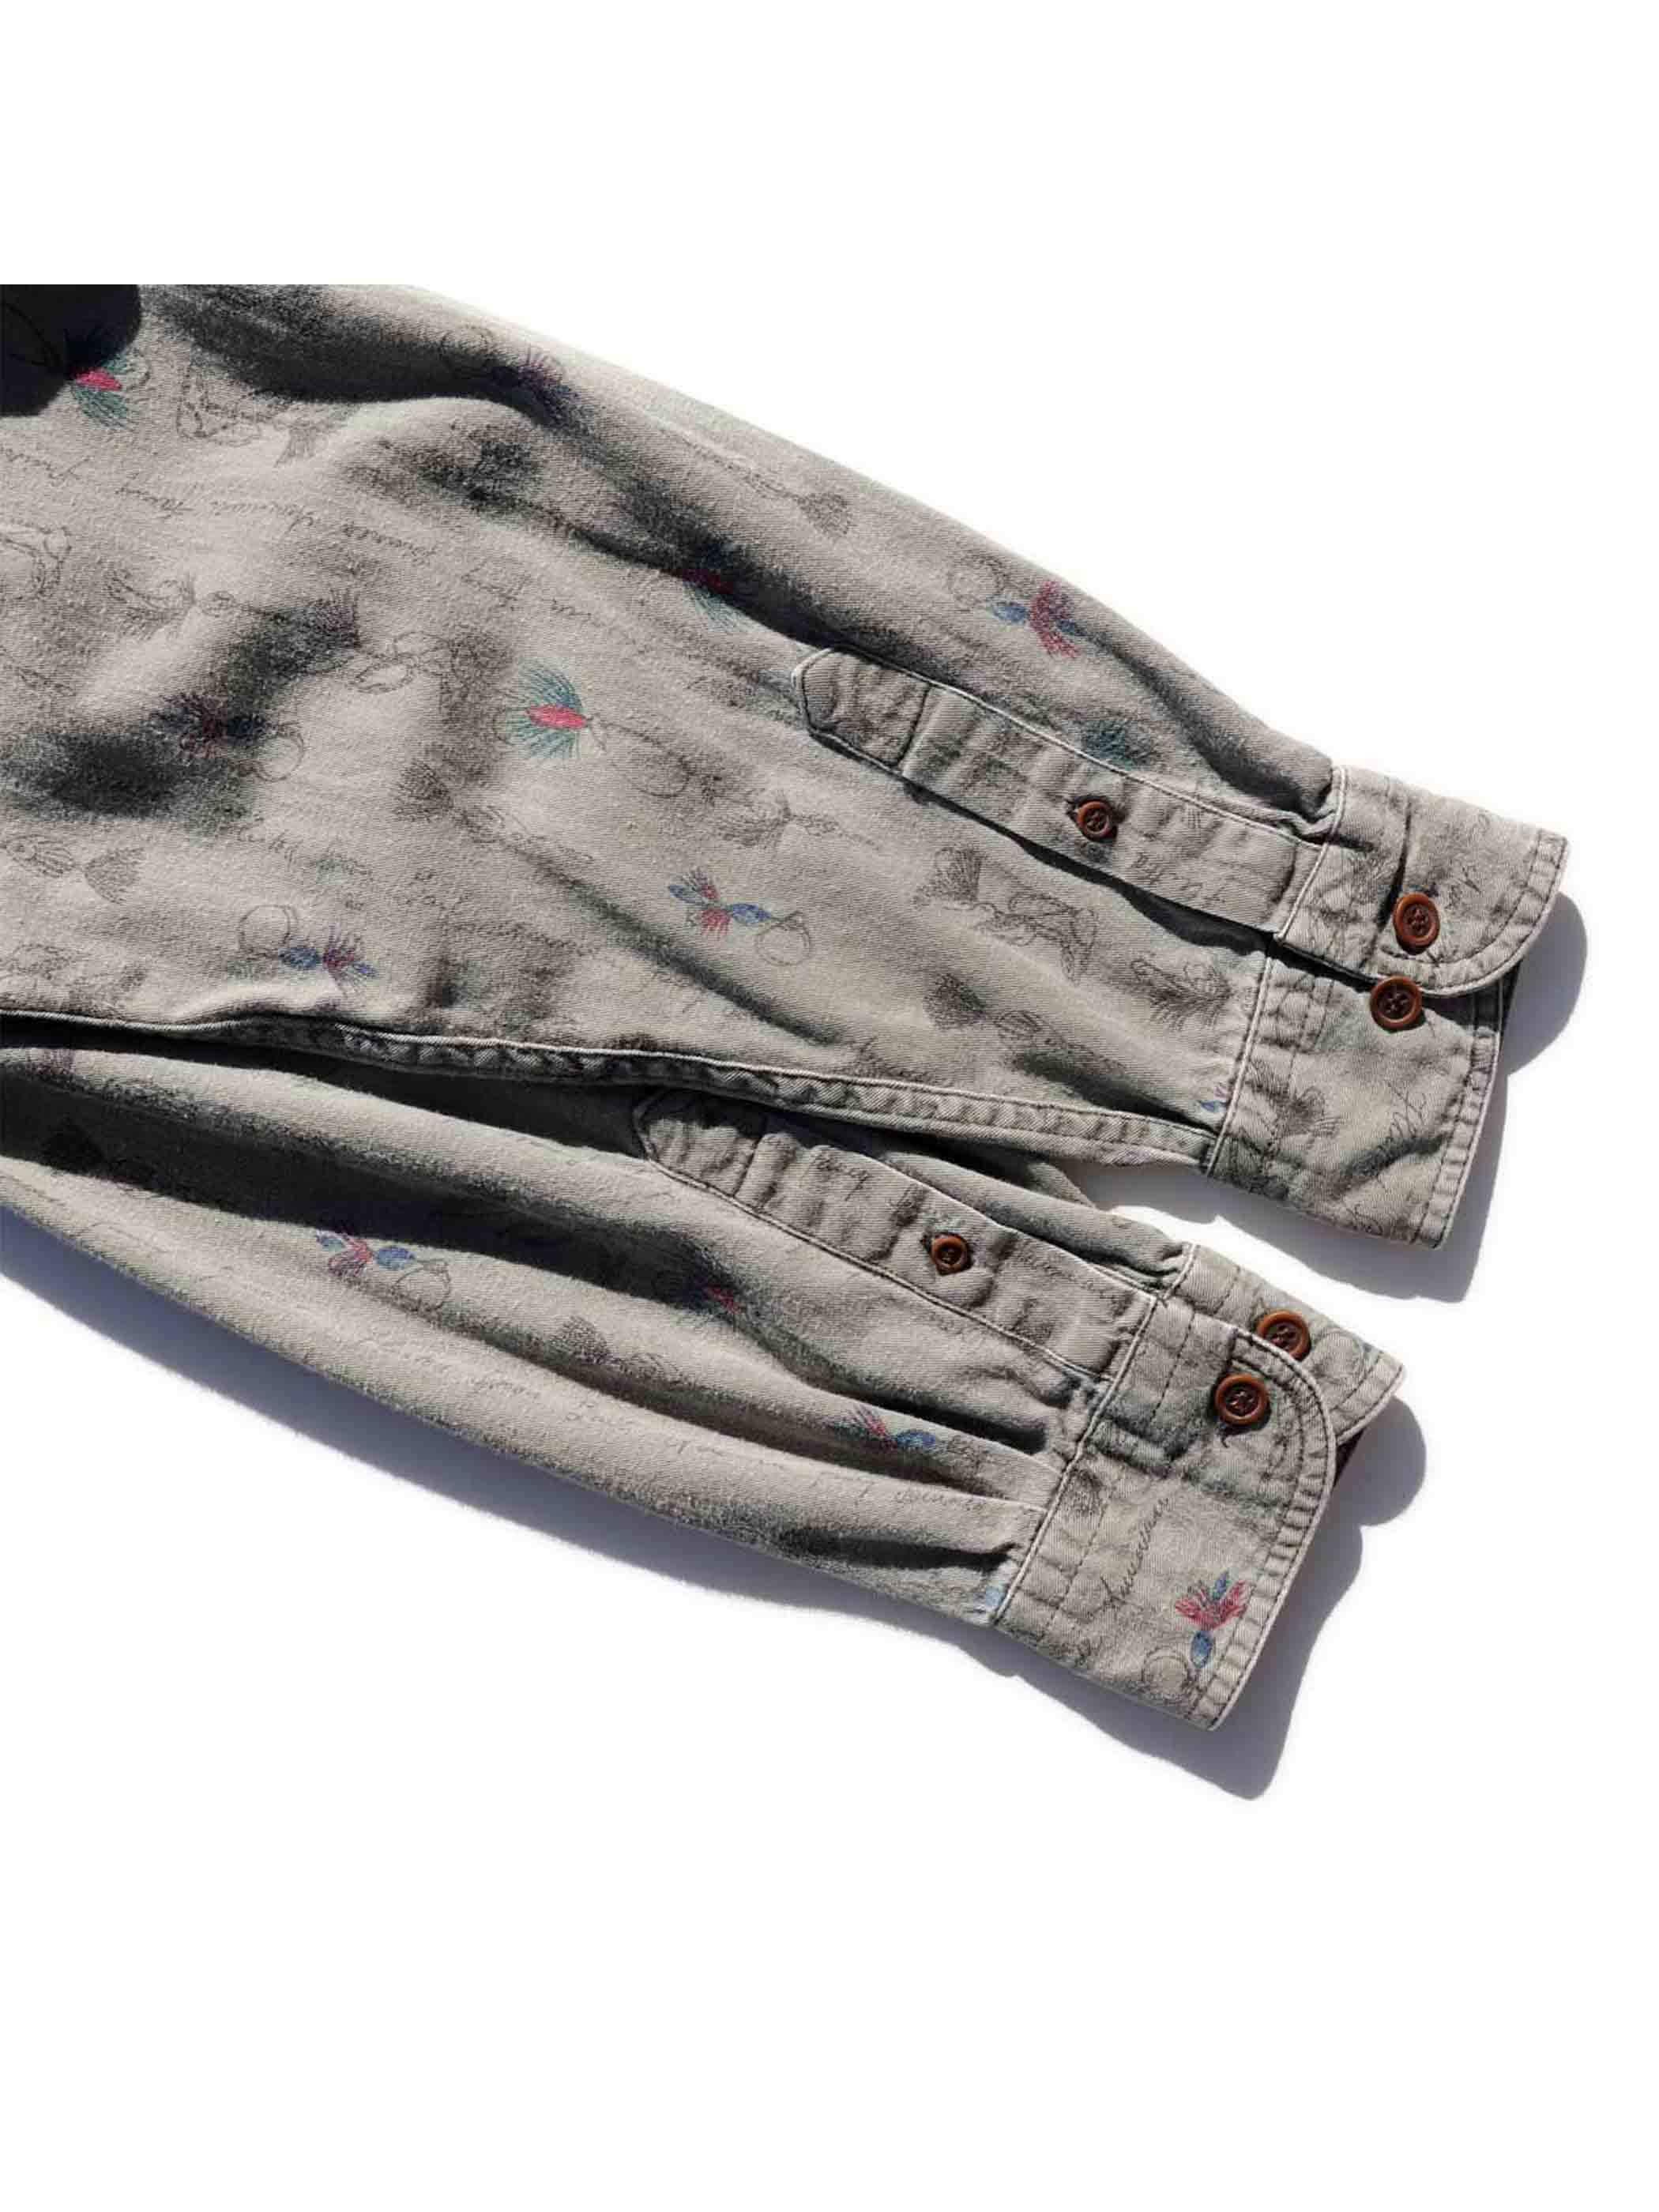 90's WOOLRICH 毛鉤柄 ボタンダウンシャツ [L]